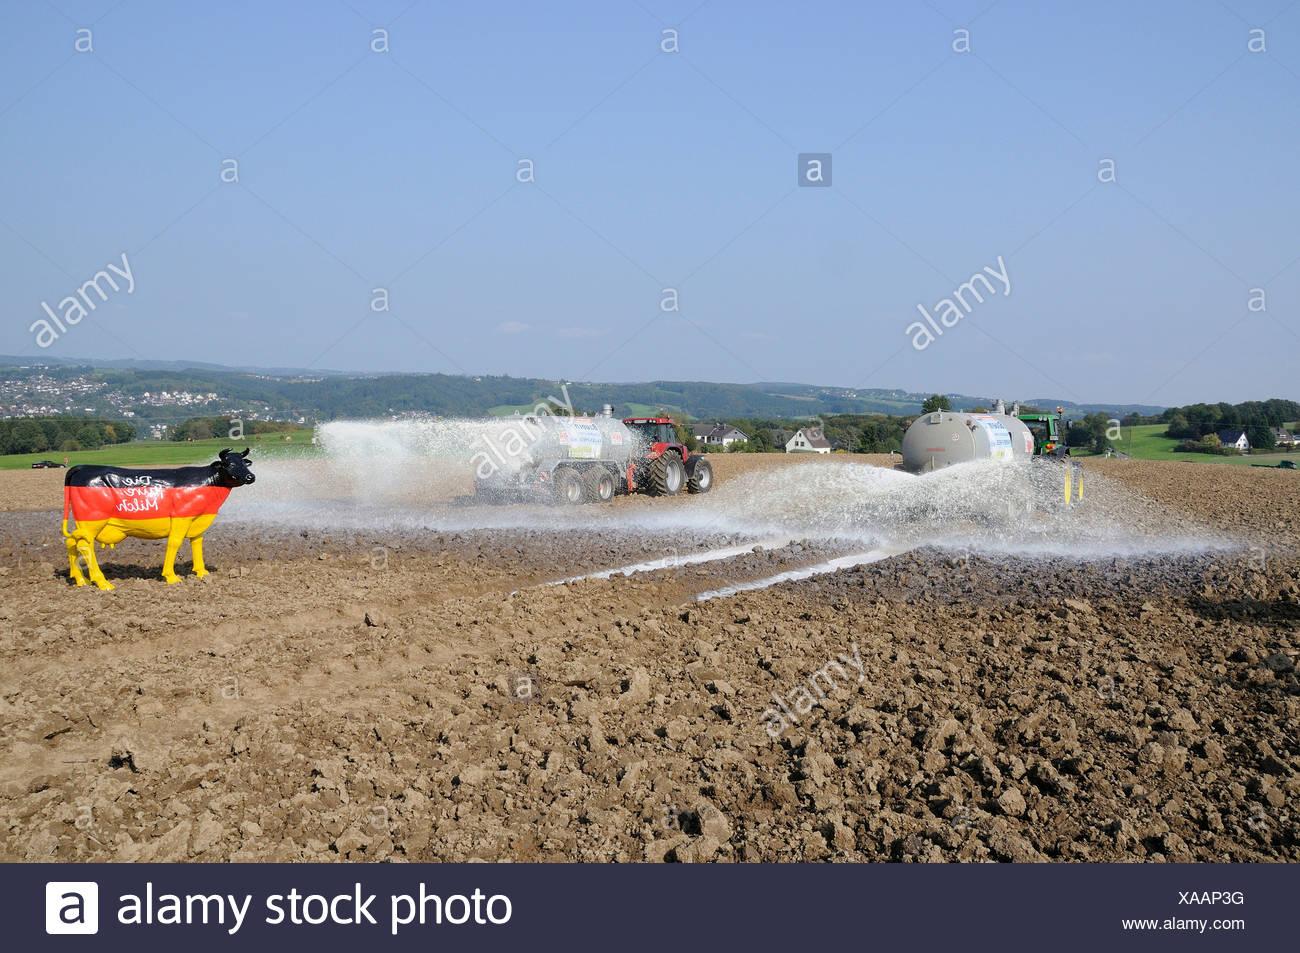 Dairy farmers dumping their milk in protest on a field, Overath, Rheinisch-Bergische Kreis, North Rhine-Westphalia, Germany, Eu - Stock Image